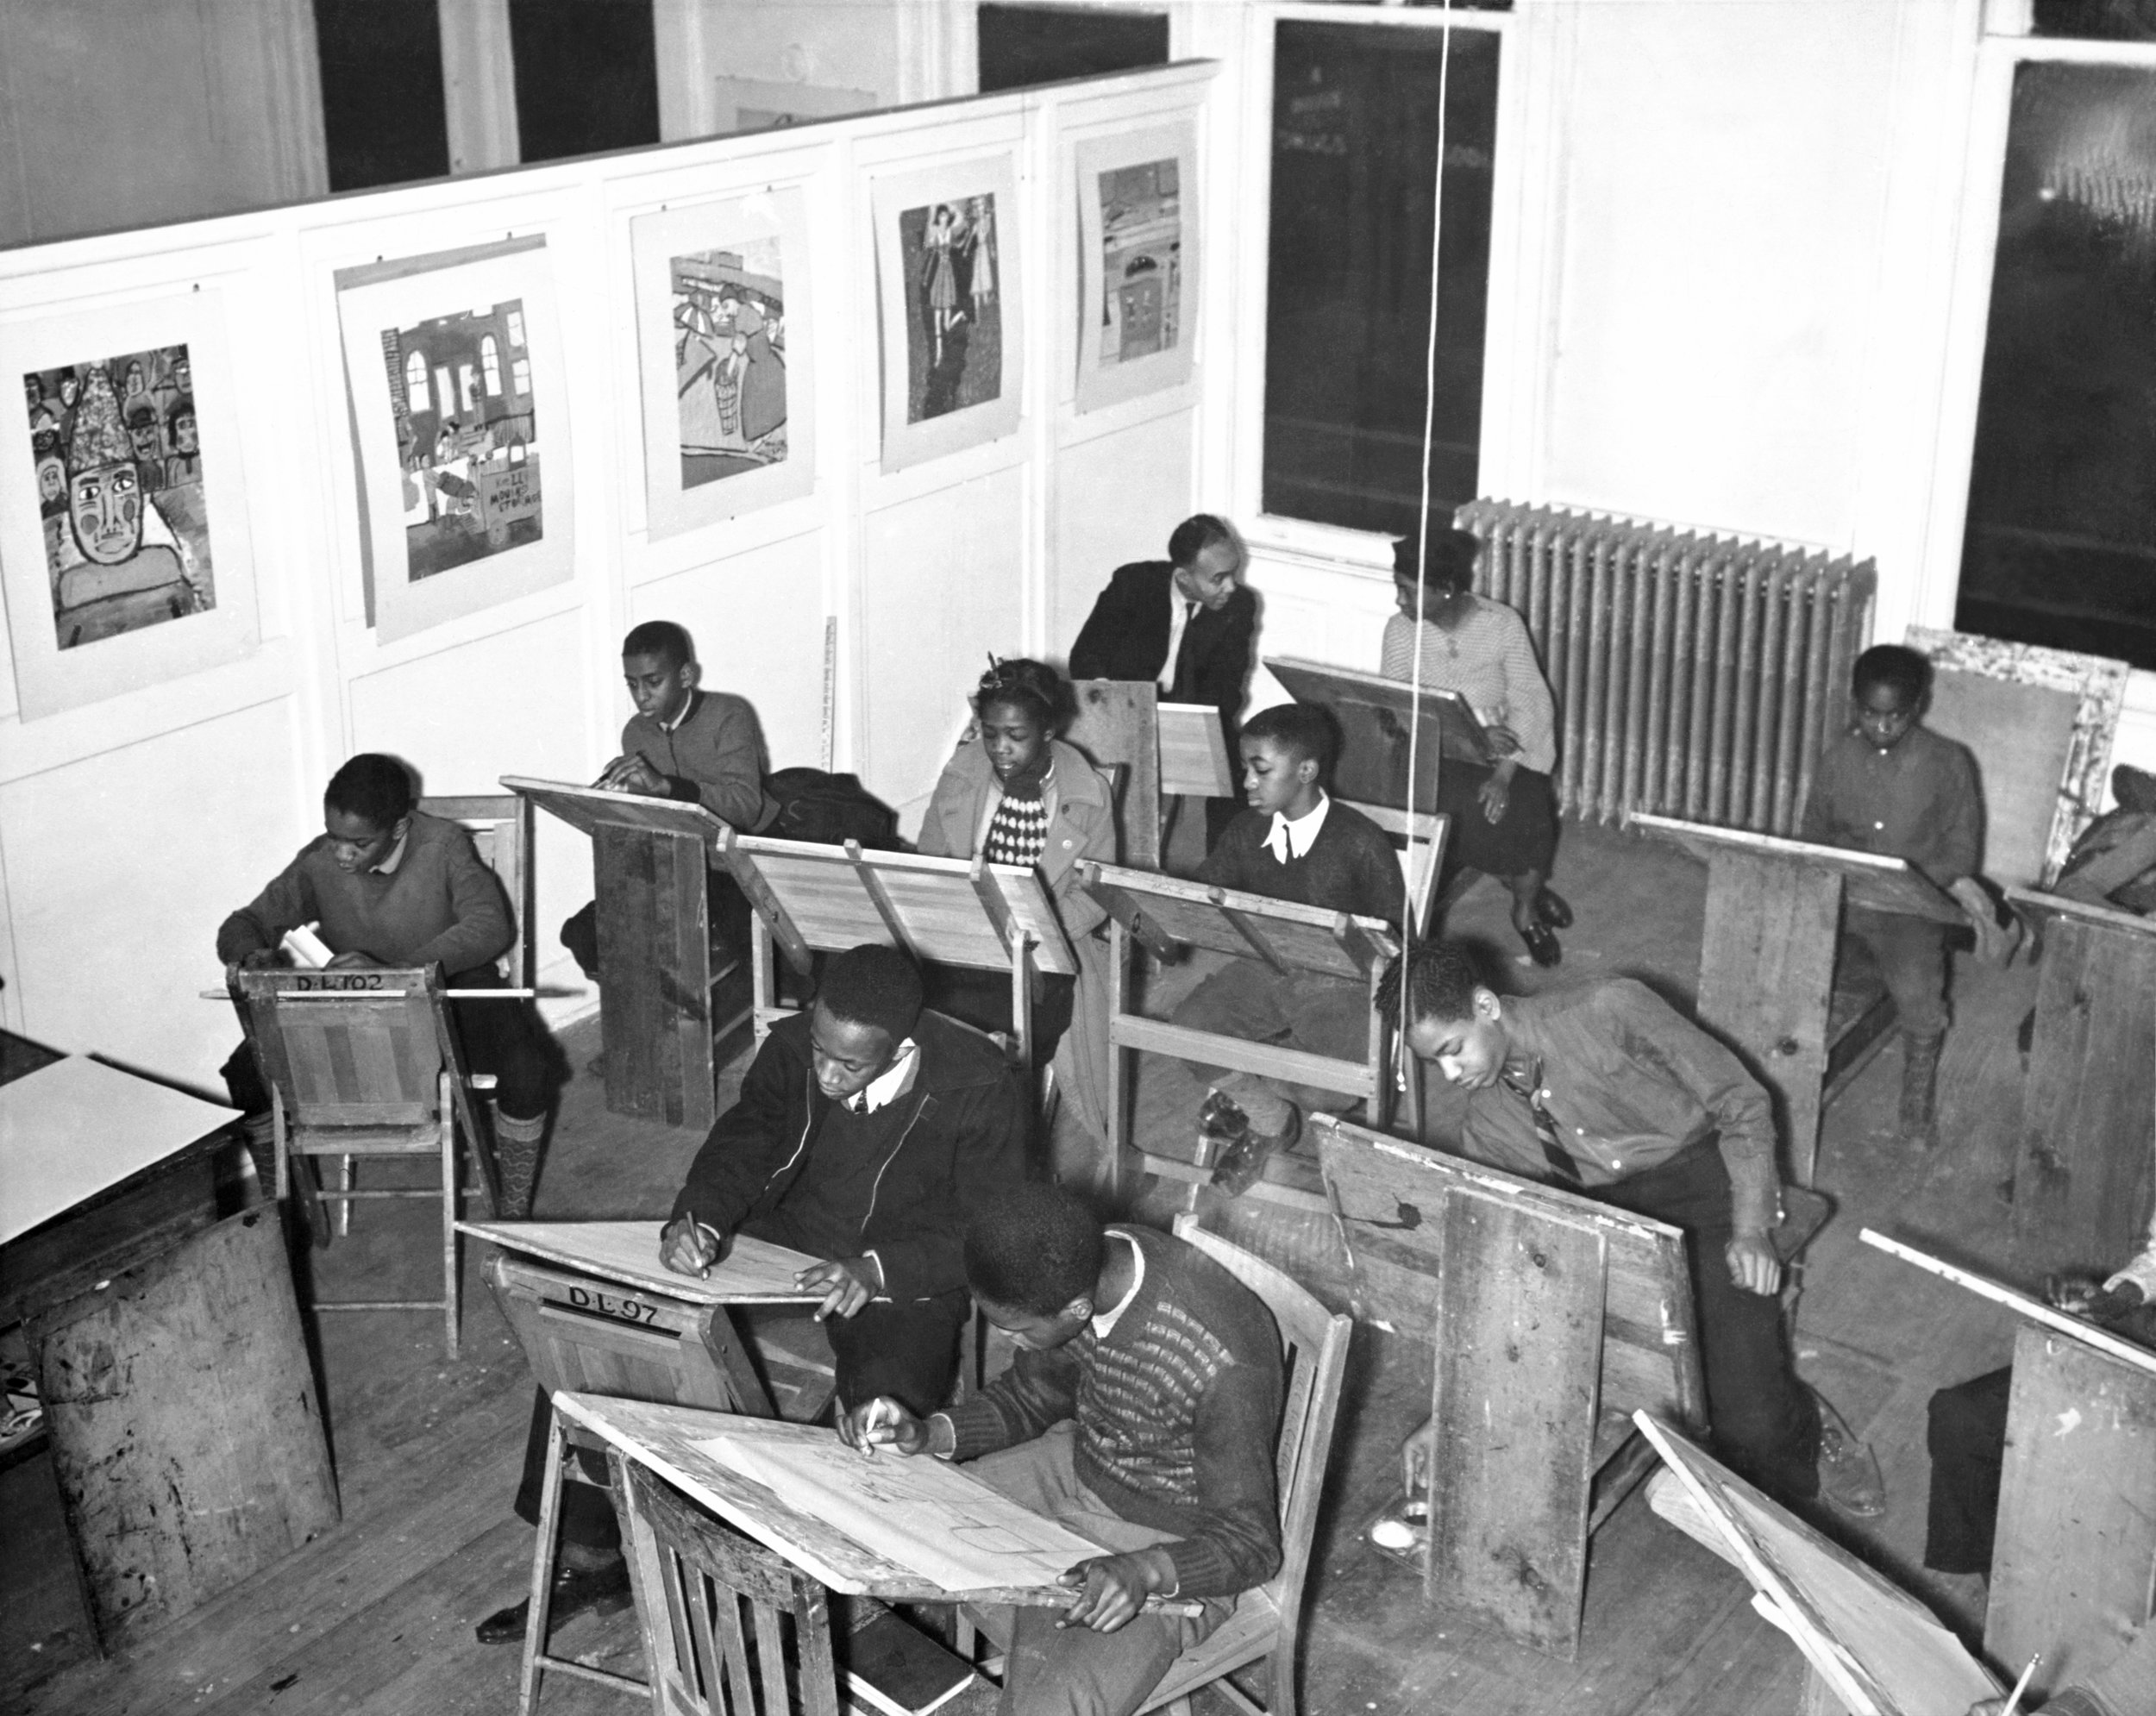 Class at the Harlem Community Art Center (January 1, 1938) (Wikipedia)